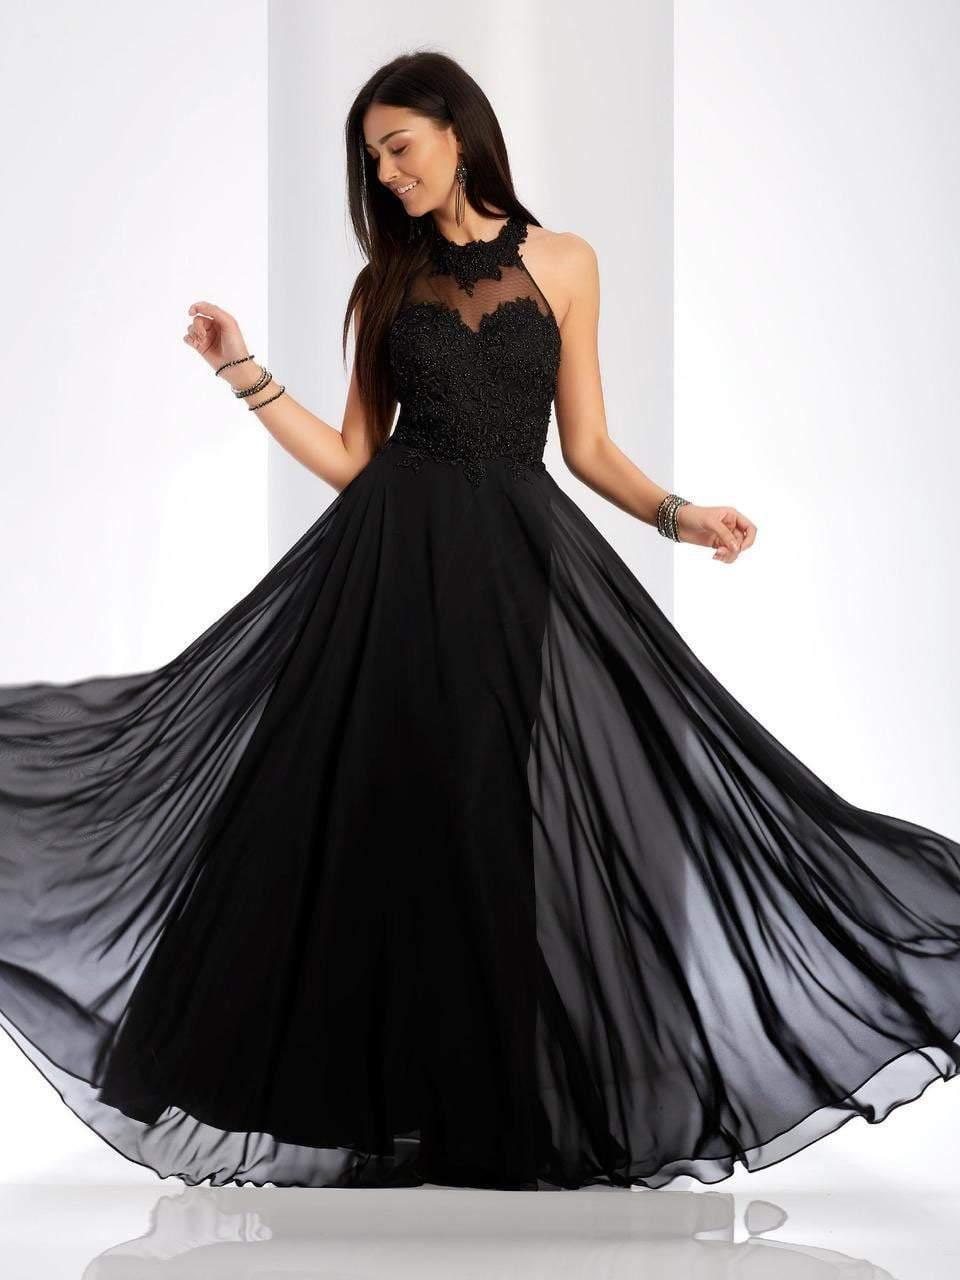 Clarisse - 3528 Jeweled Lace Applique Halter Gown